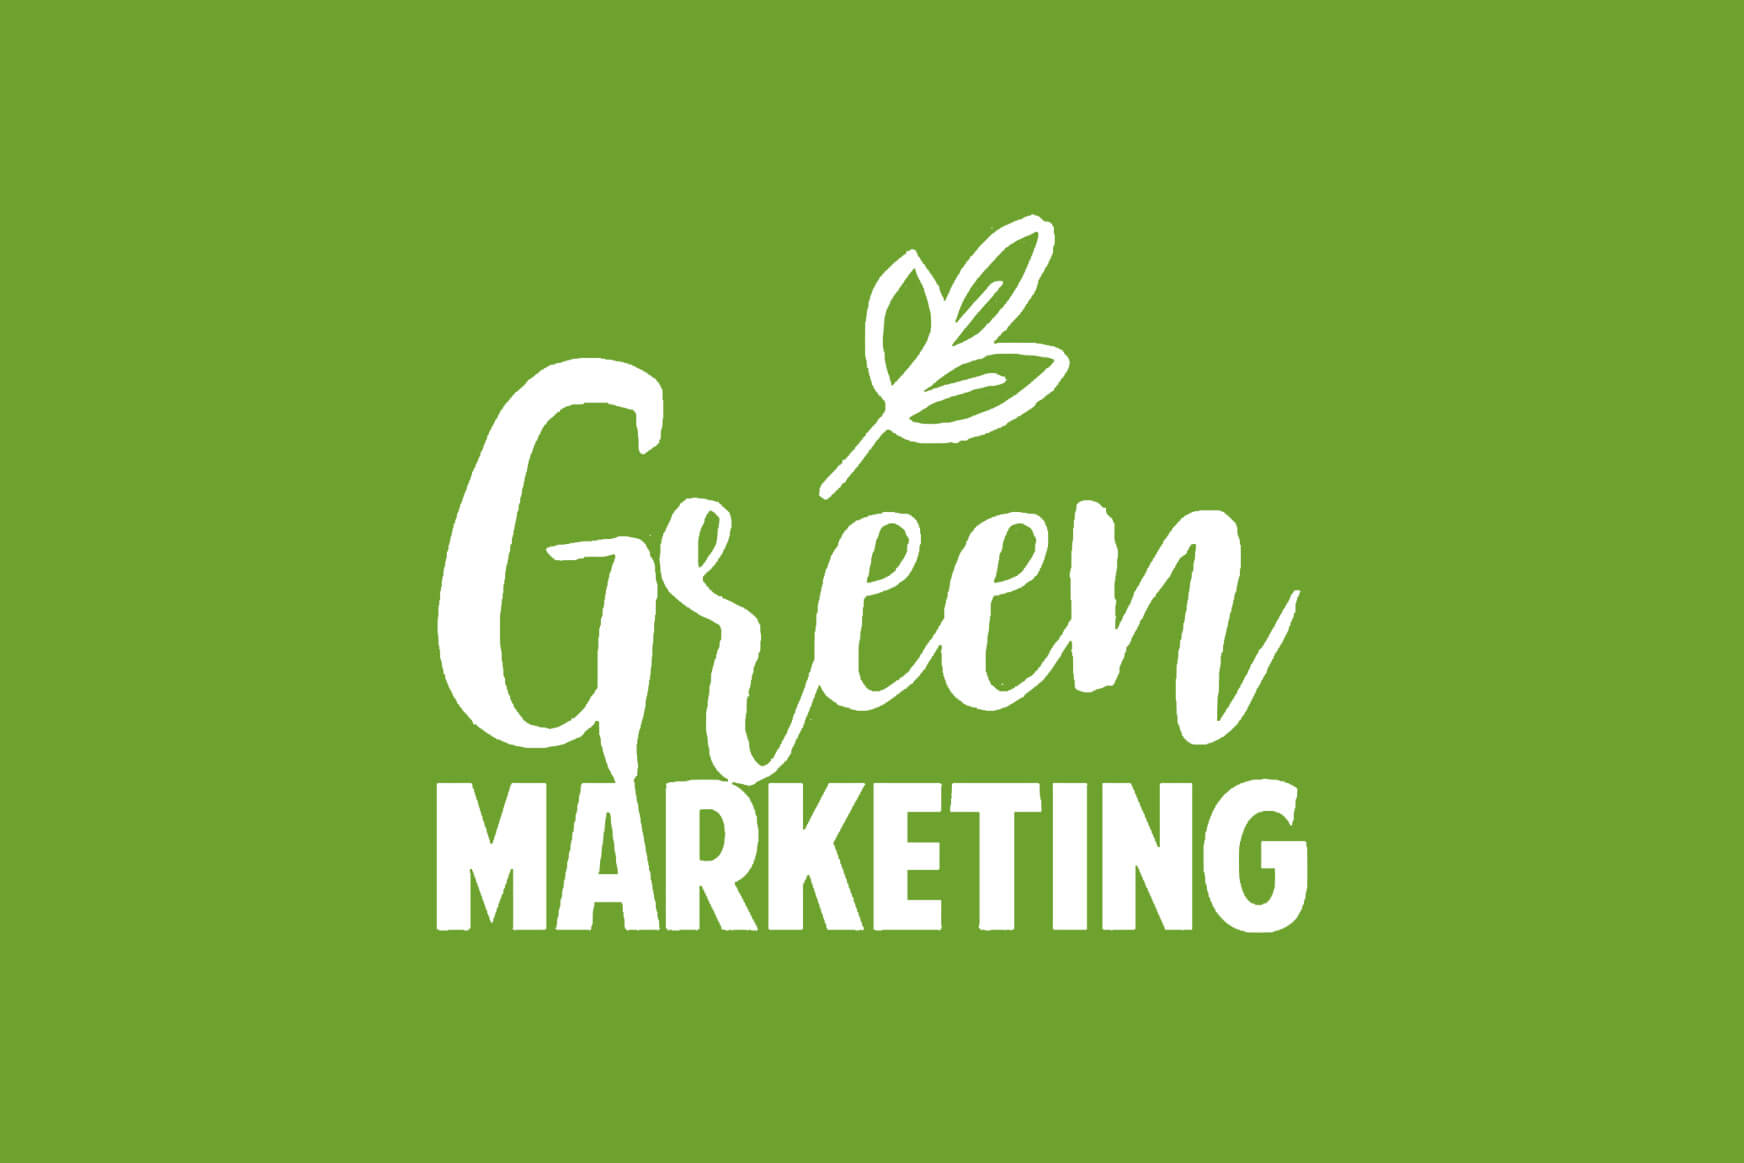 ¿Qué entendemos por marketing ecológico?